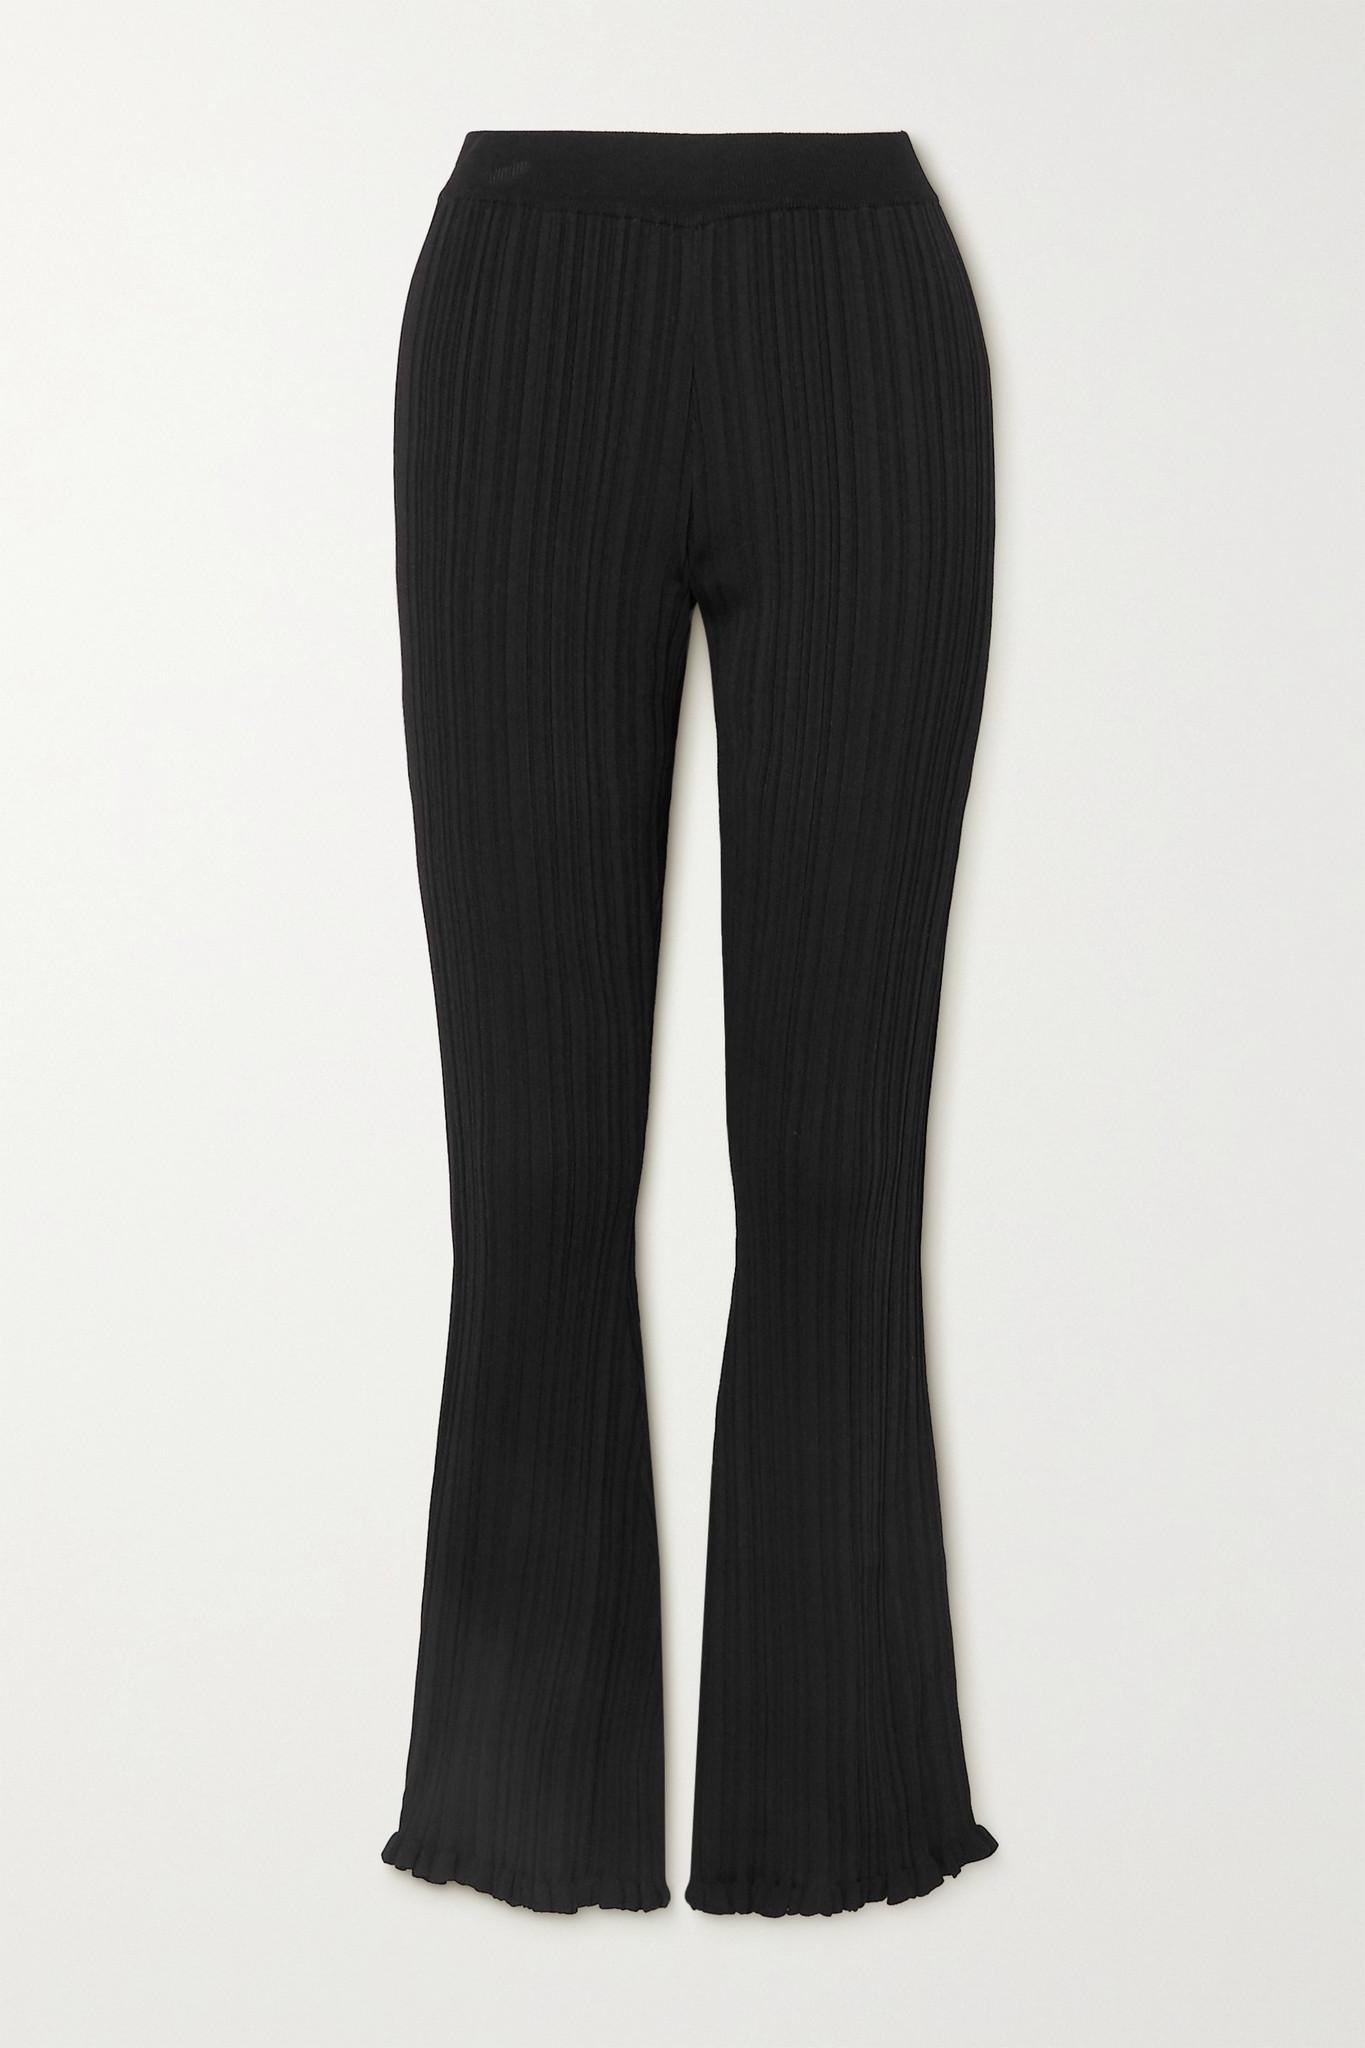 HOLZWEILER - Dahlia Ruffled Ribbed-knit Flared Pants - Black - x small